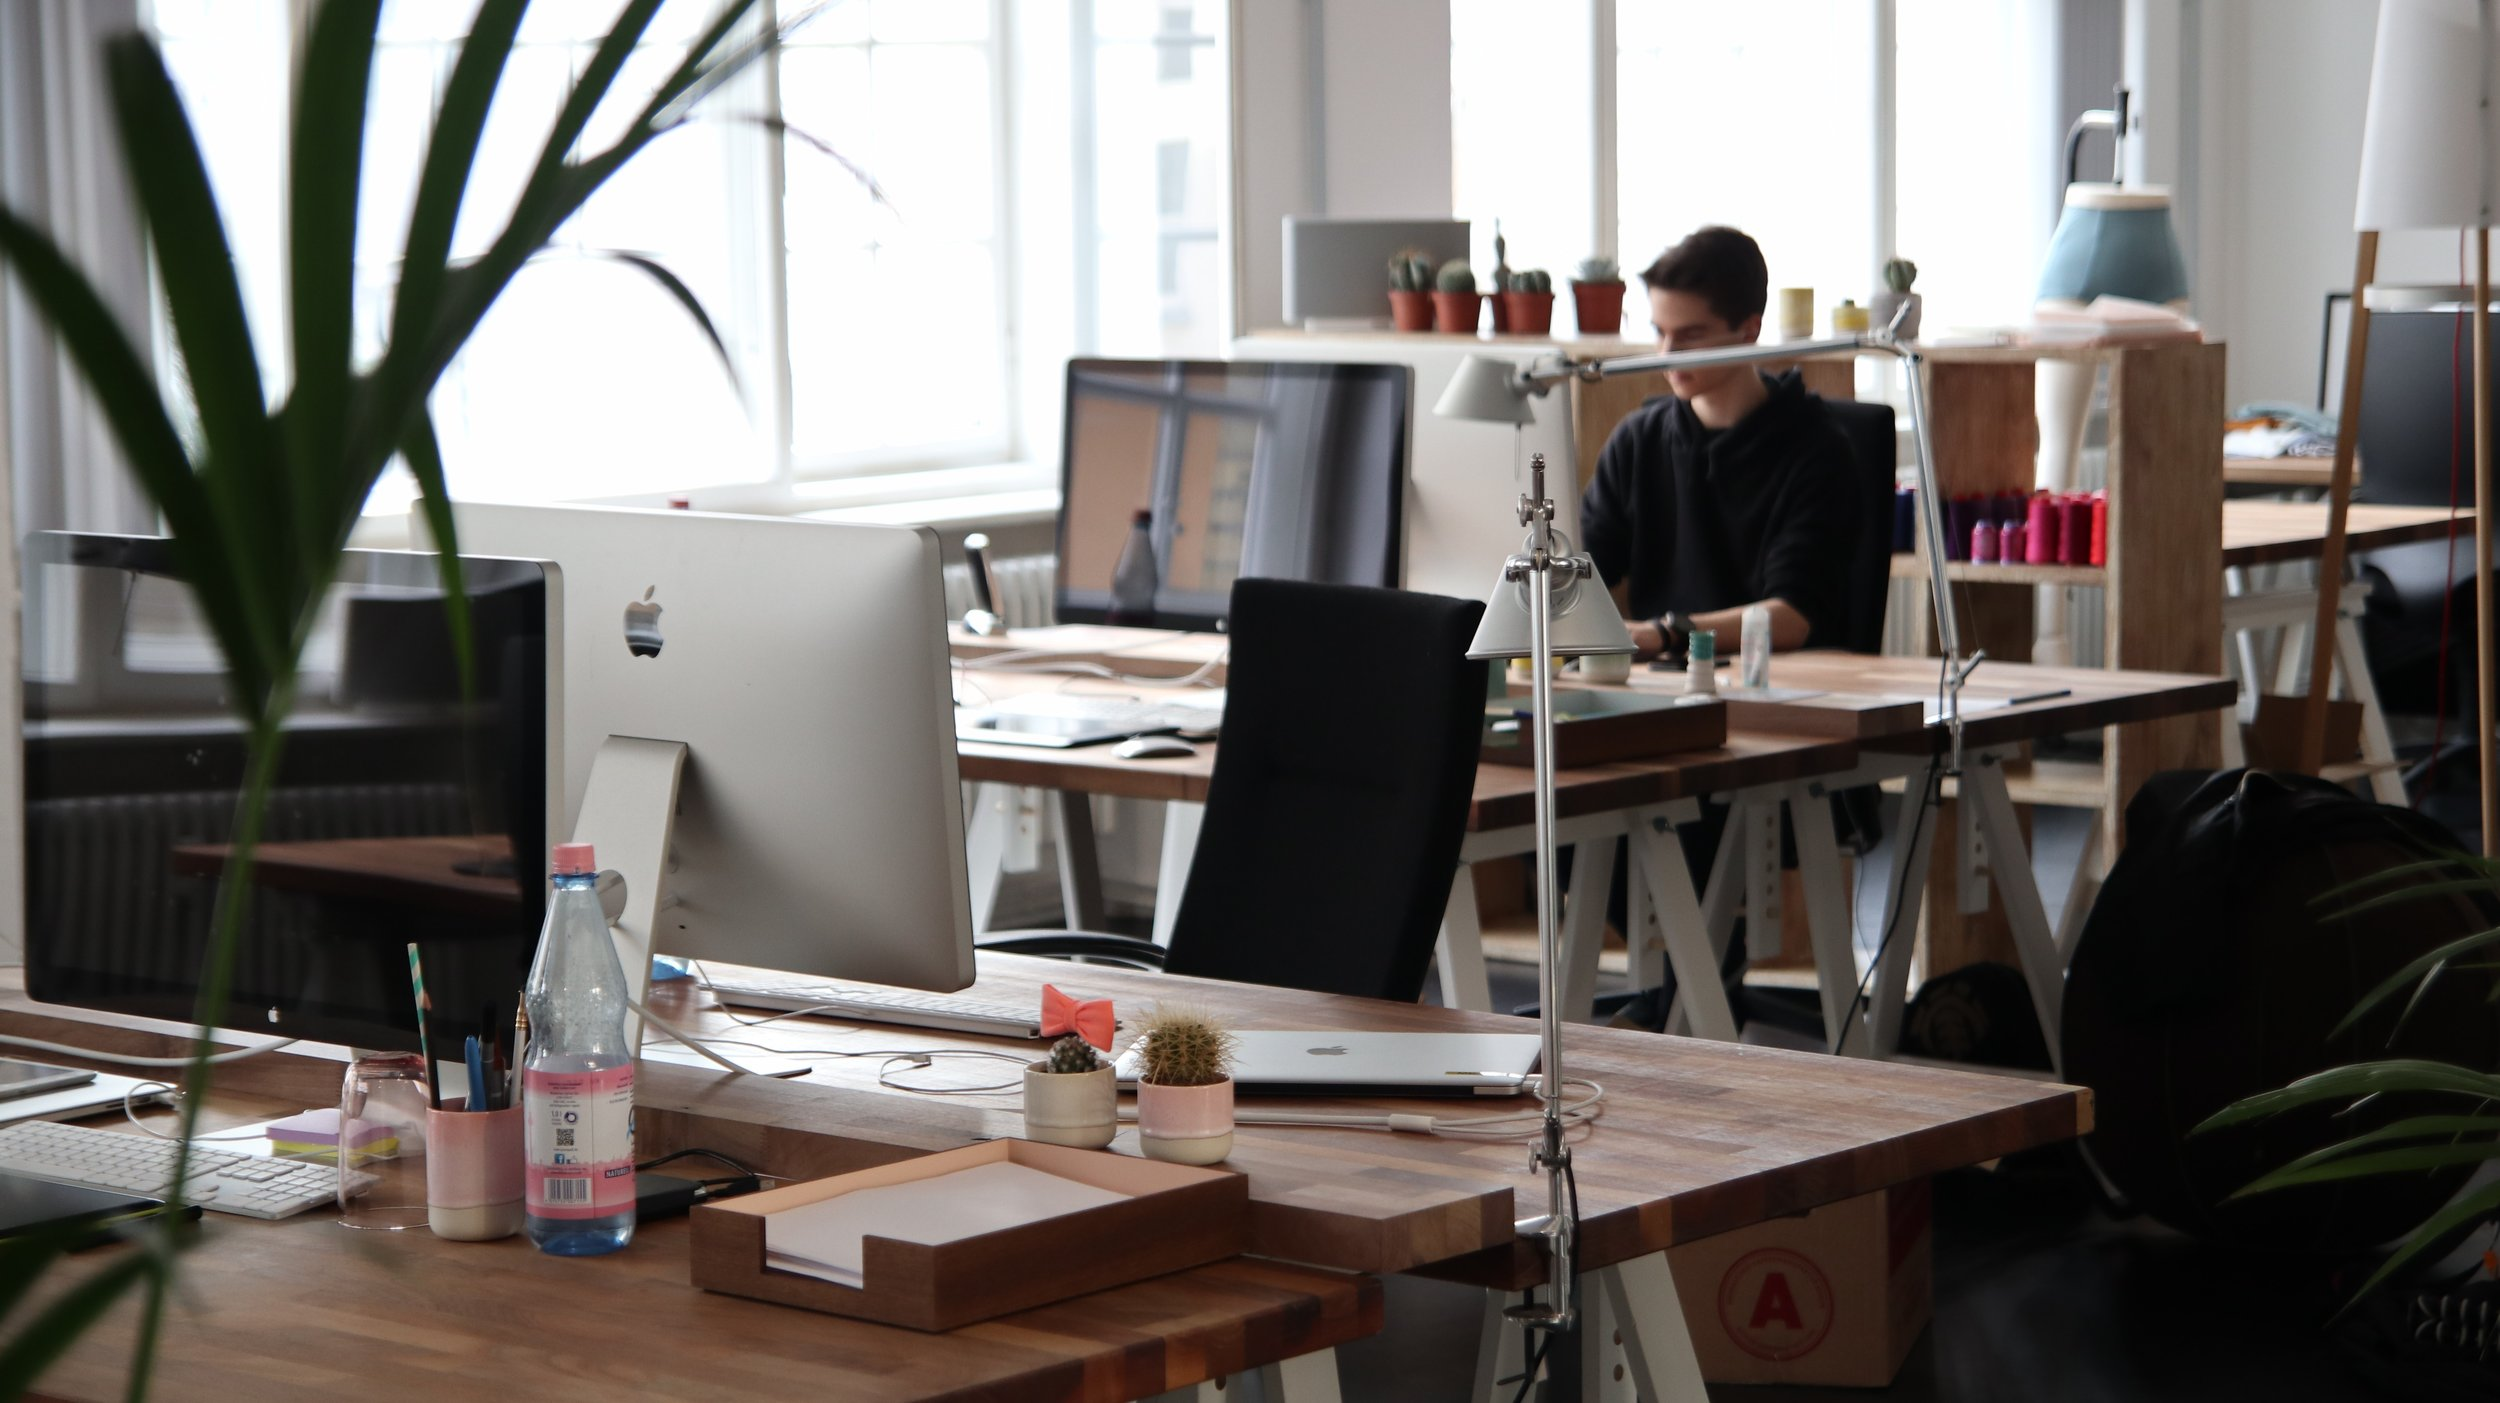 adult-business-chair-380769.jpg